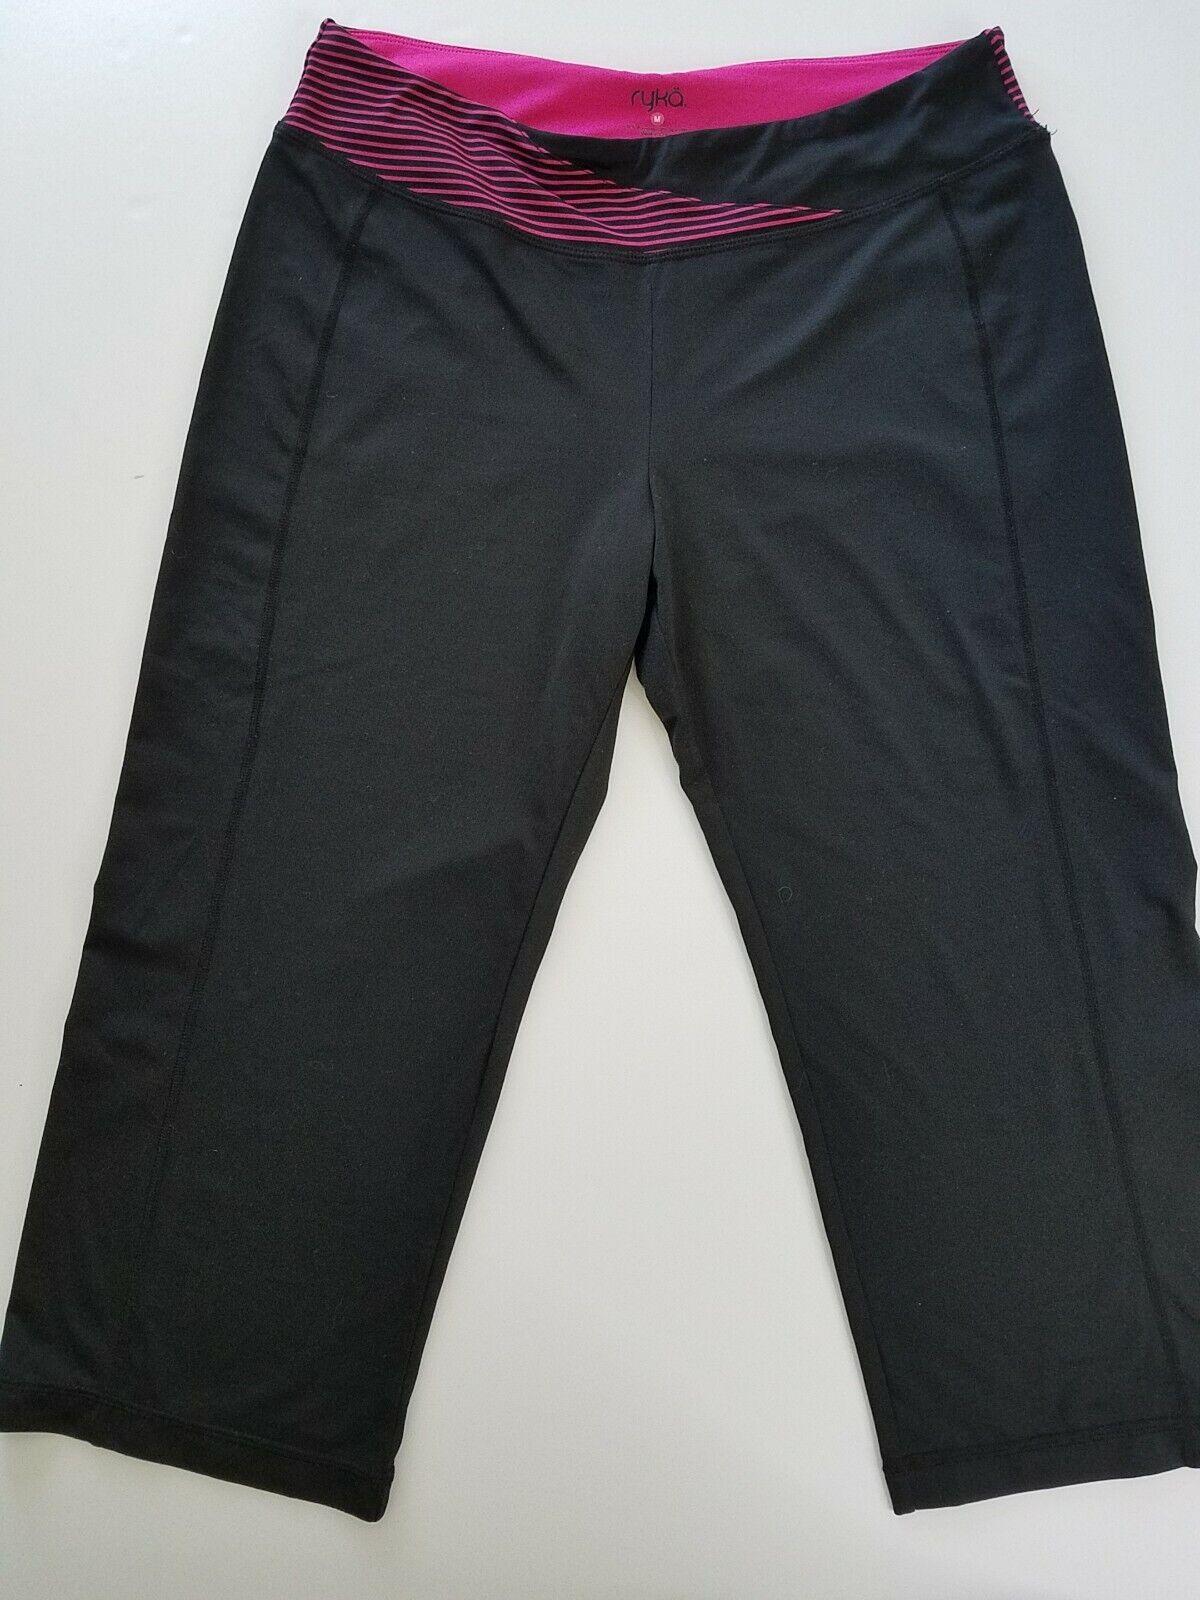 RYKA Women's Medium Black Yoga Capri Pants Athletic Lounge Activewear Stretch